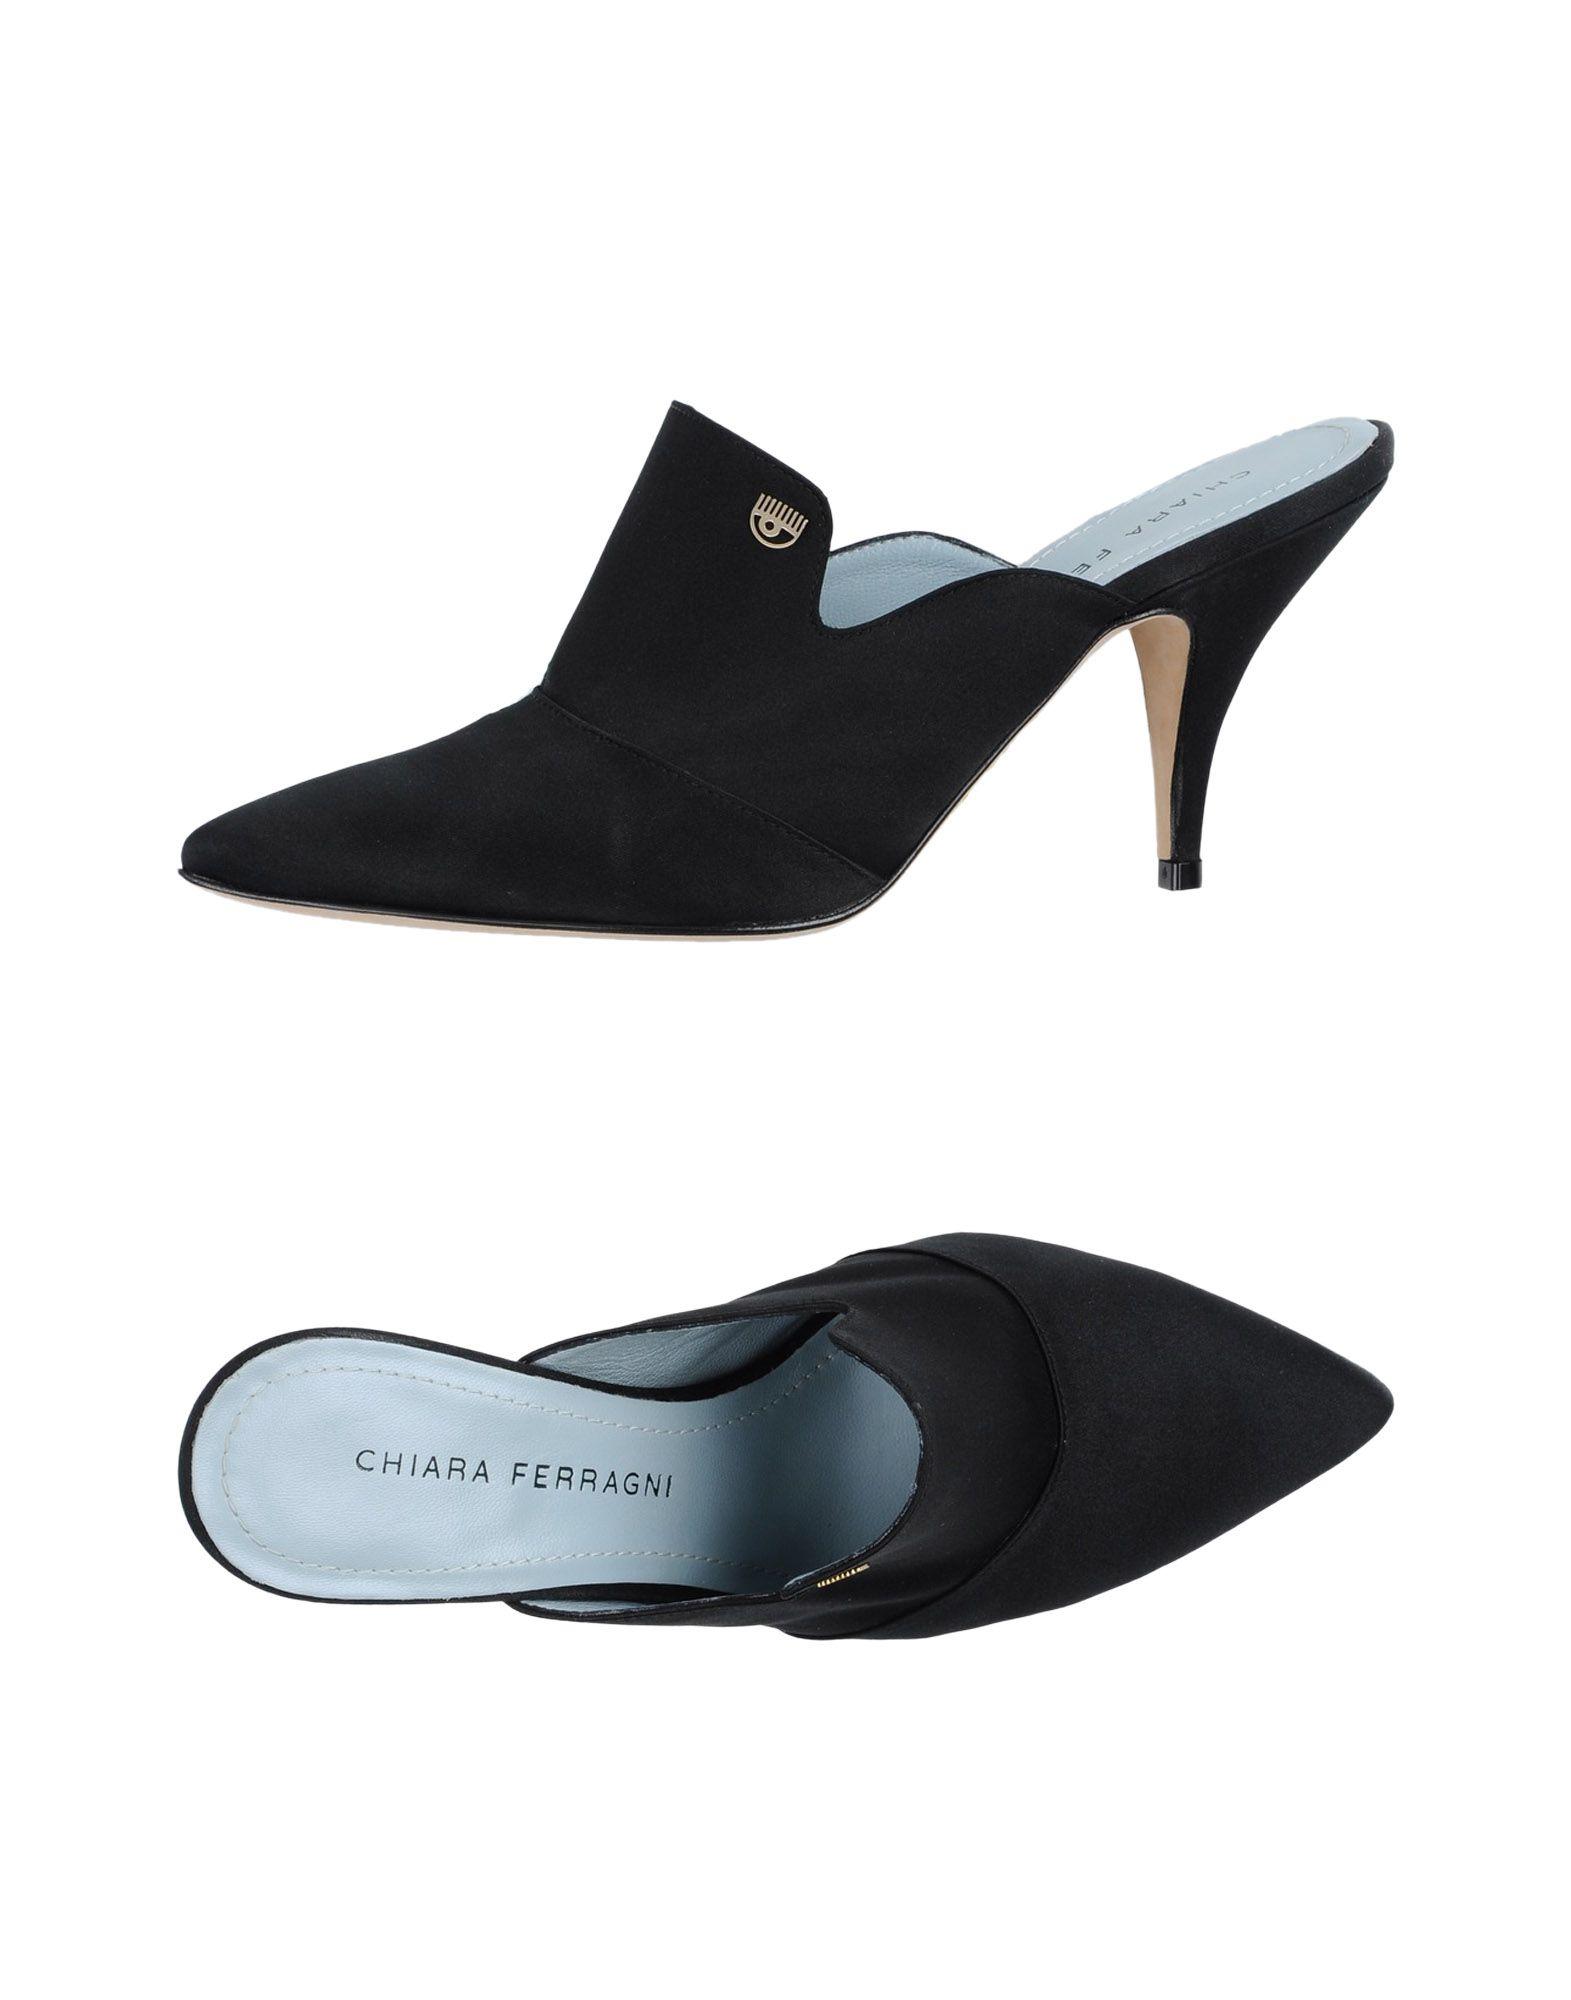 Chiara Ferragni Pantoletten Damen  11339519IQGut aussehende strapazierfähige Schuhe